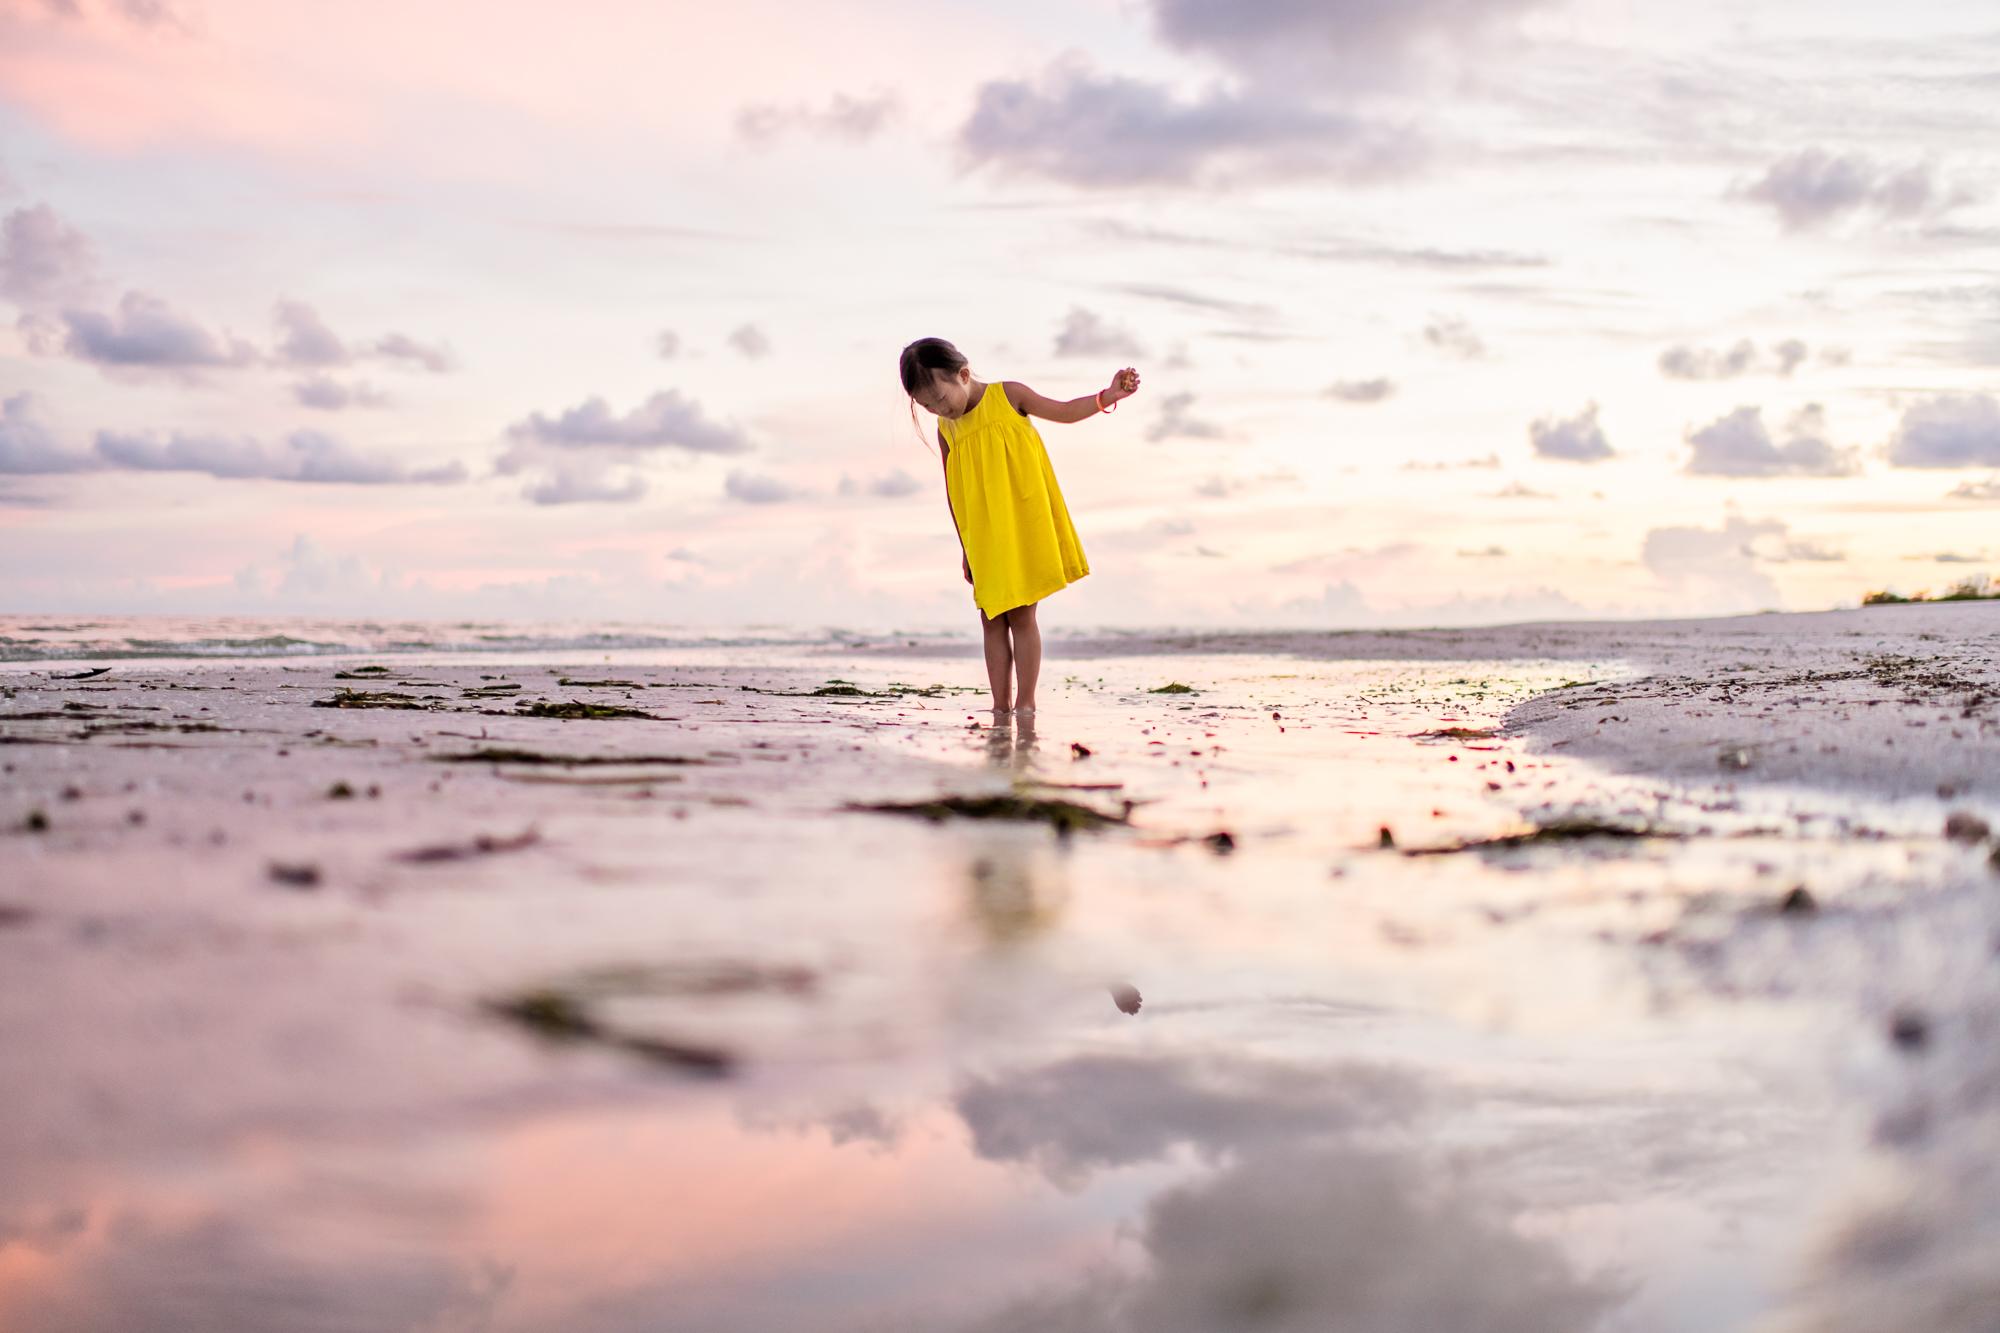 sanibel-island-beach-golden-4.jpg